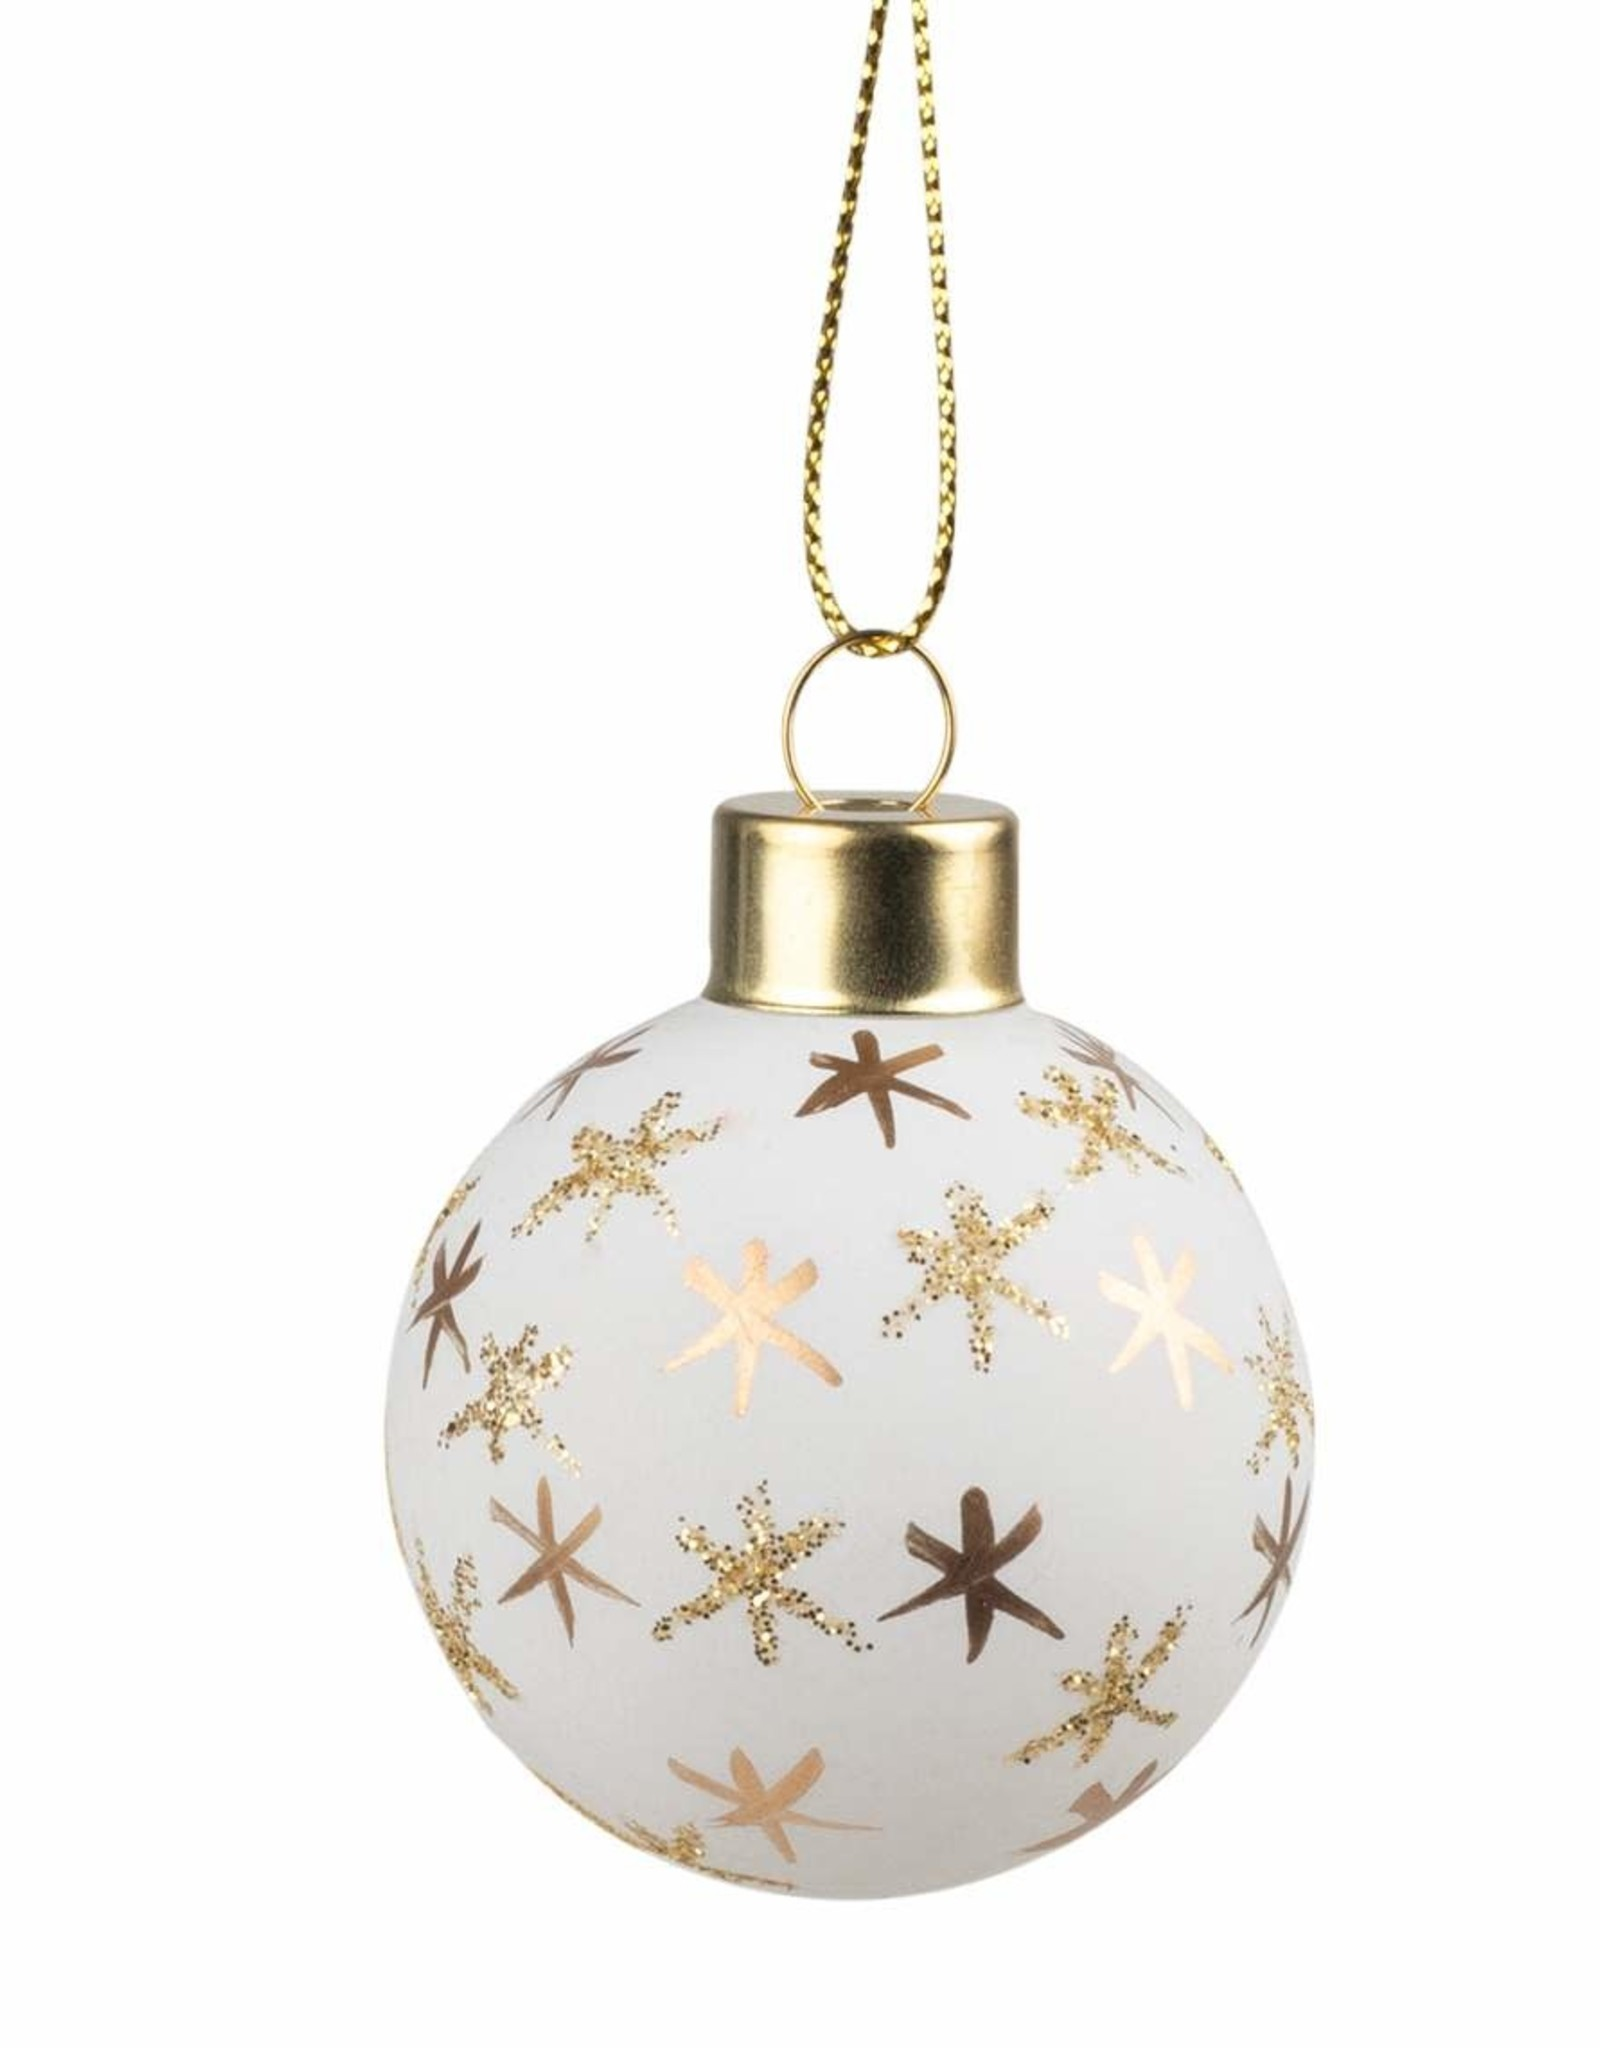 Rader Christmas Baubles or et blanc